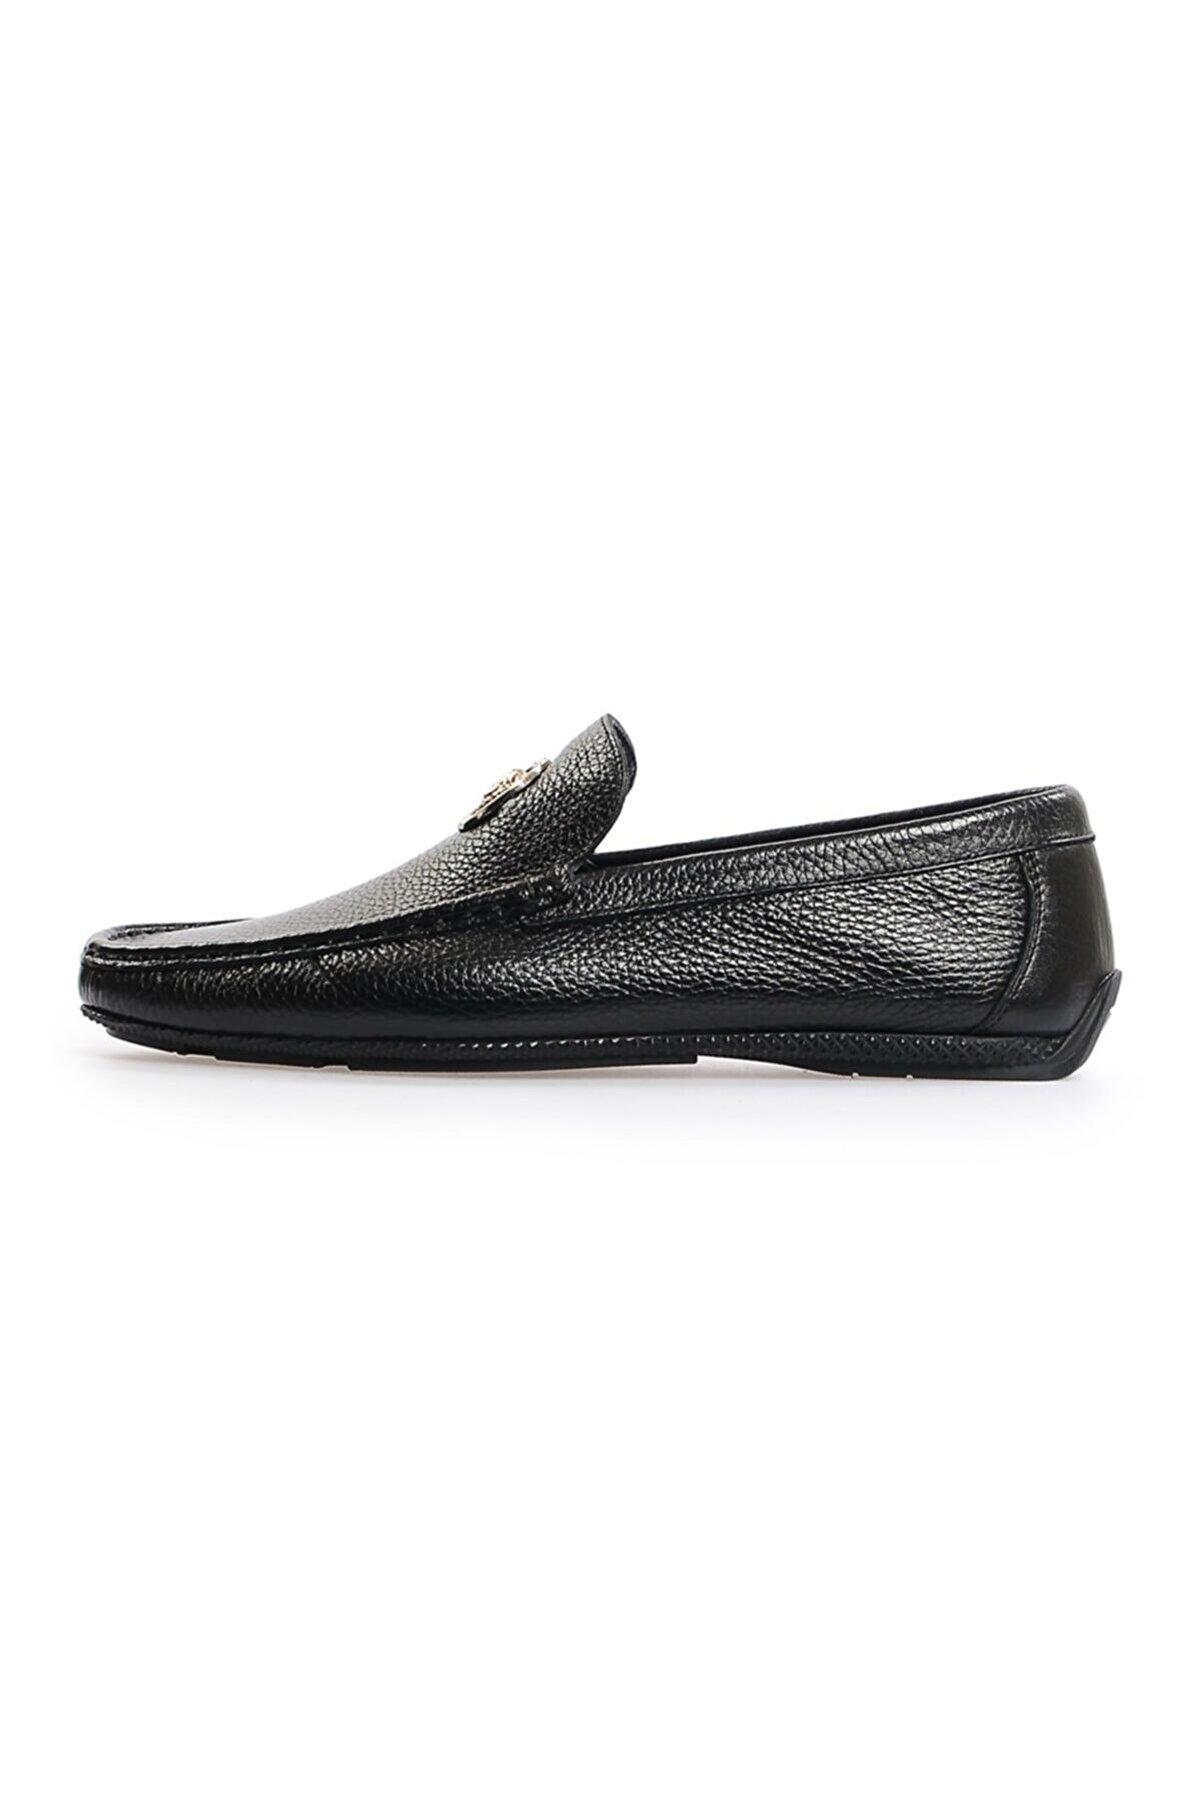 Flower Siyah Deri Toka Detaylı Loafer Ayakkabı